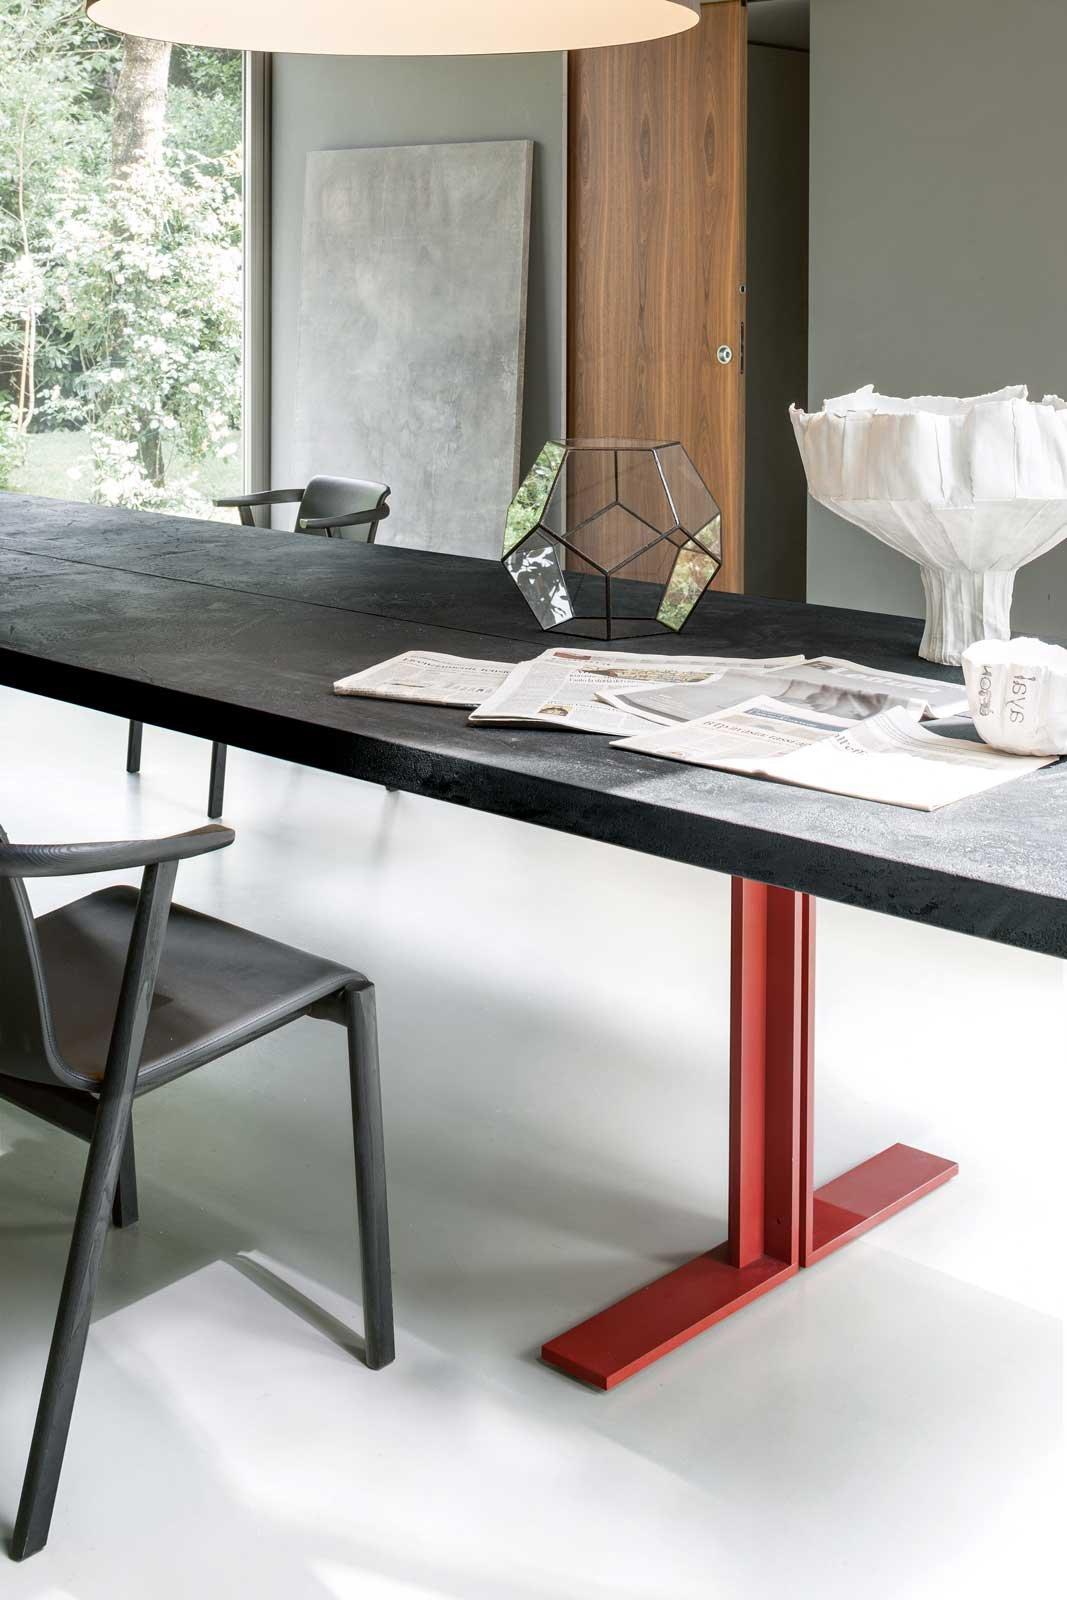 Design per la zona pranzo: i tavoli Lema, rettangolari e rotondi ...